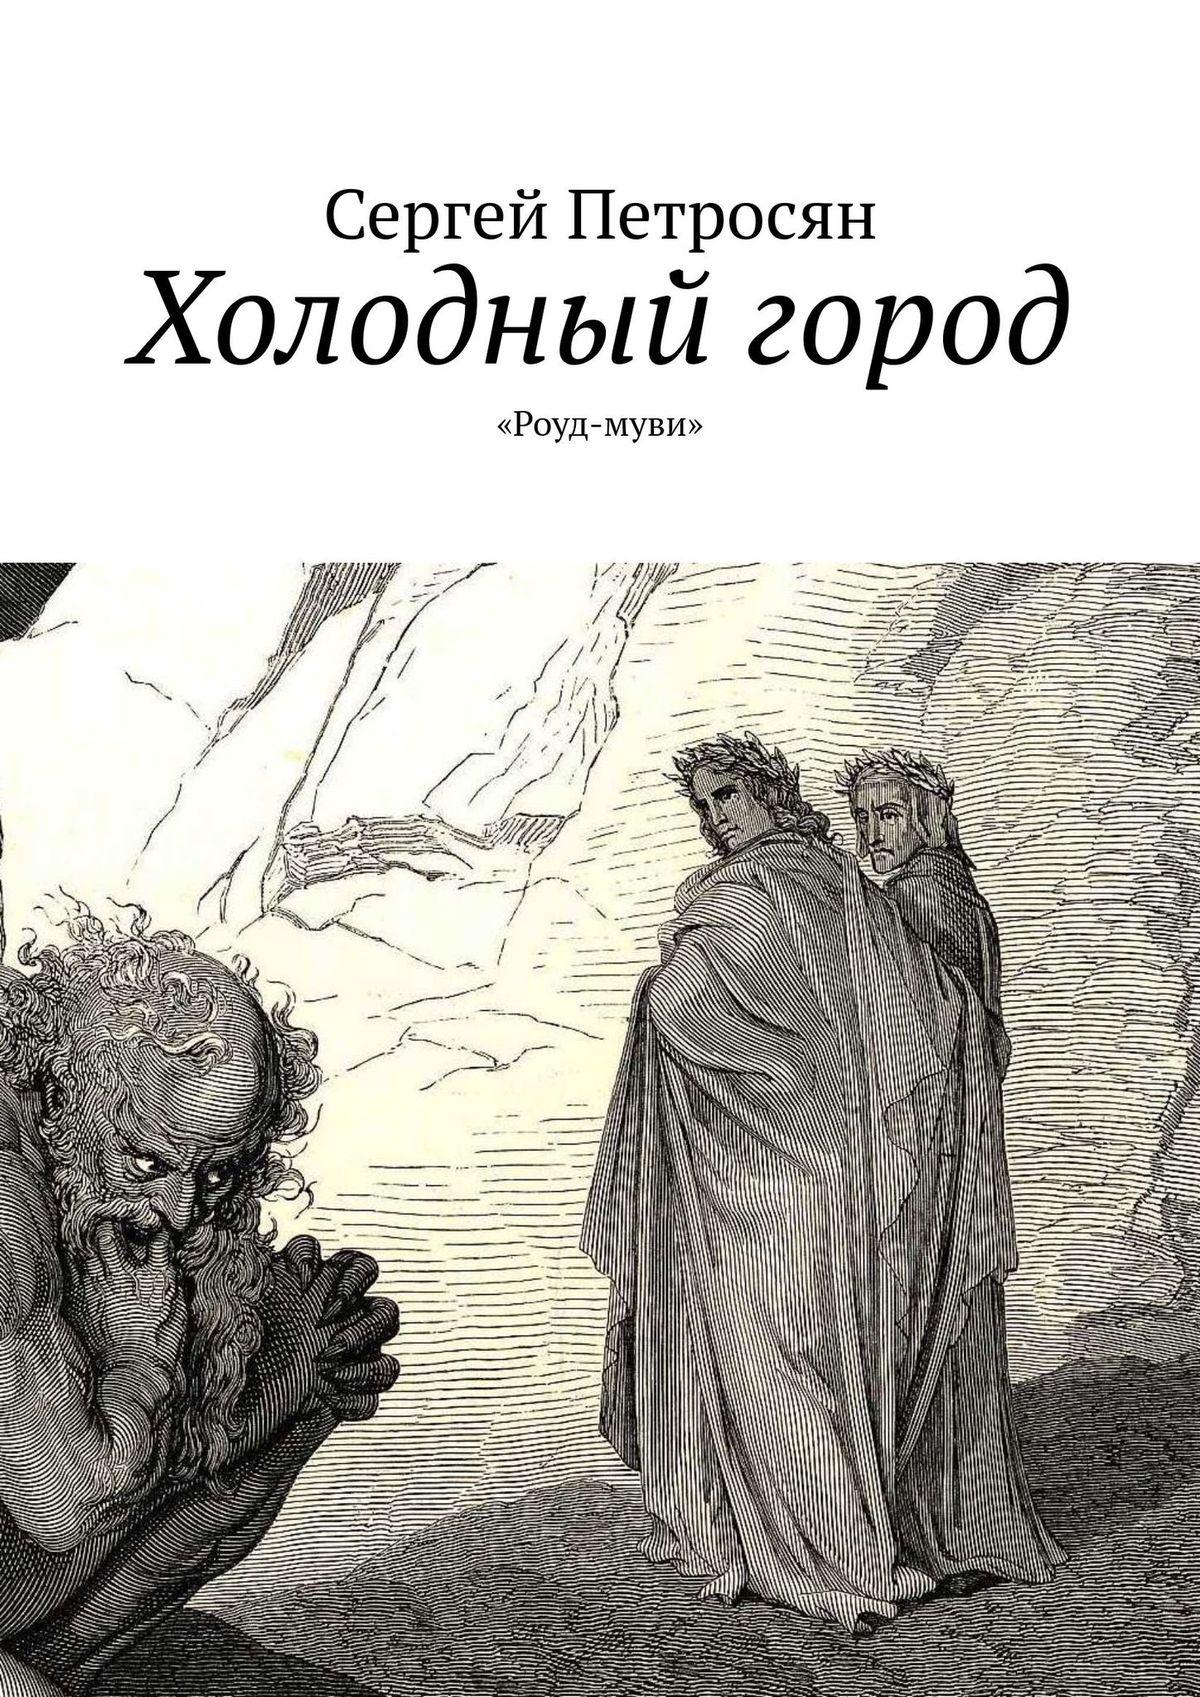 Сергей Петросян Холодный город цена